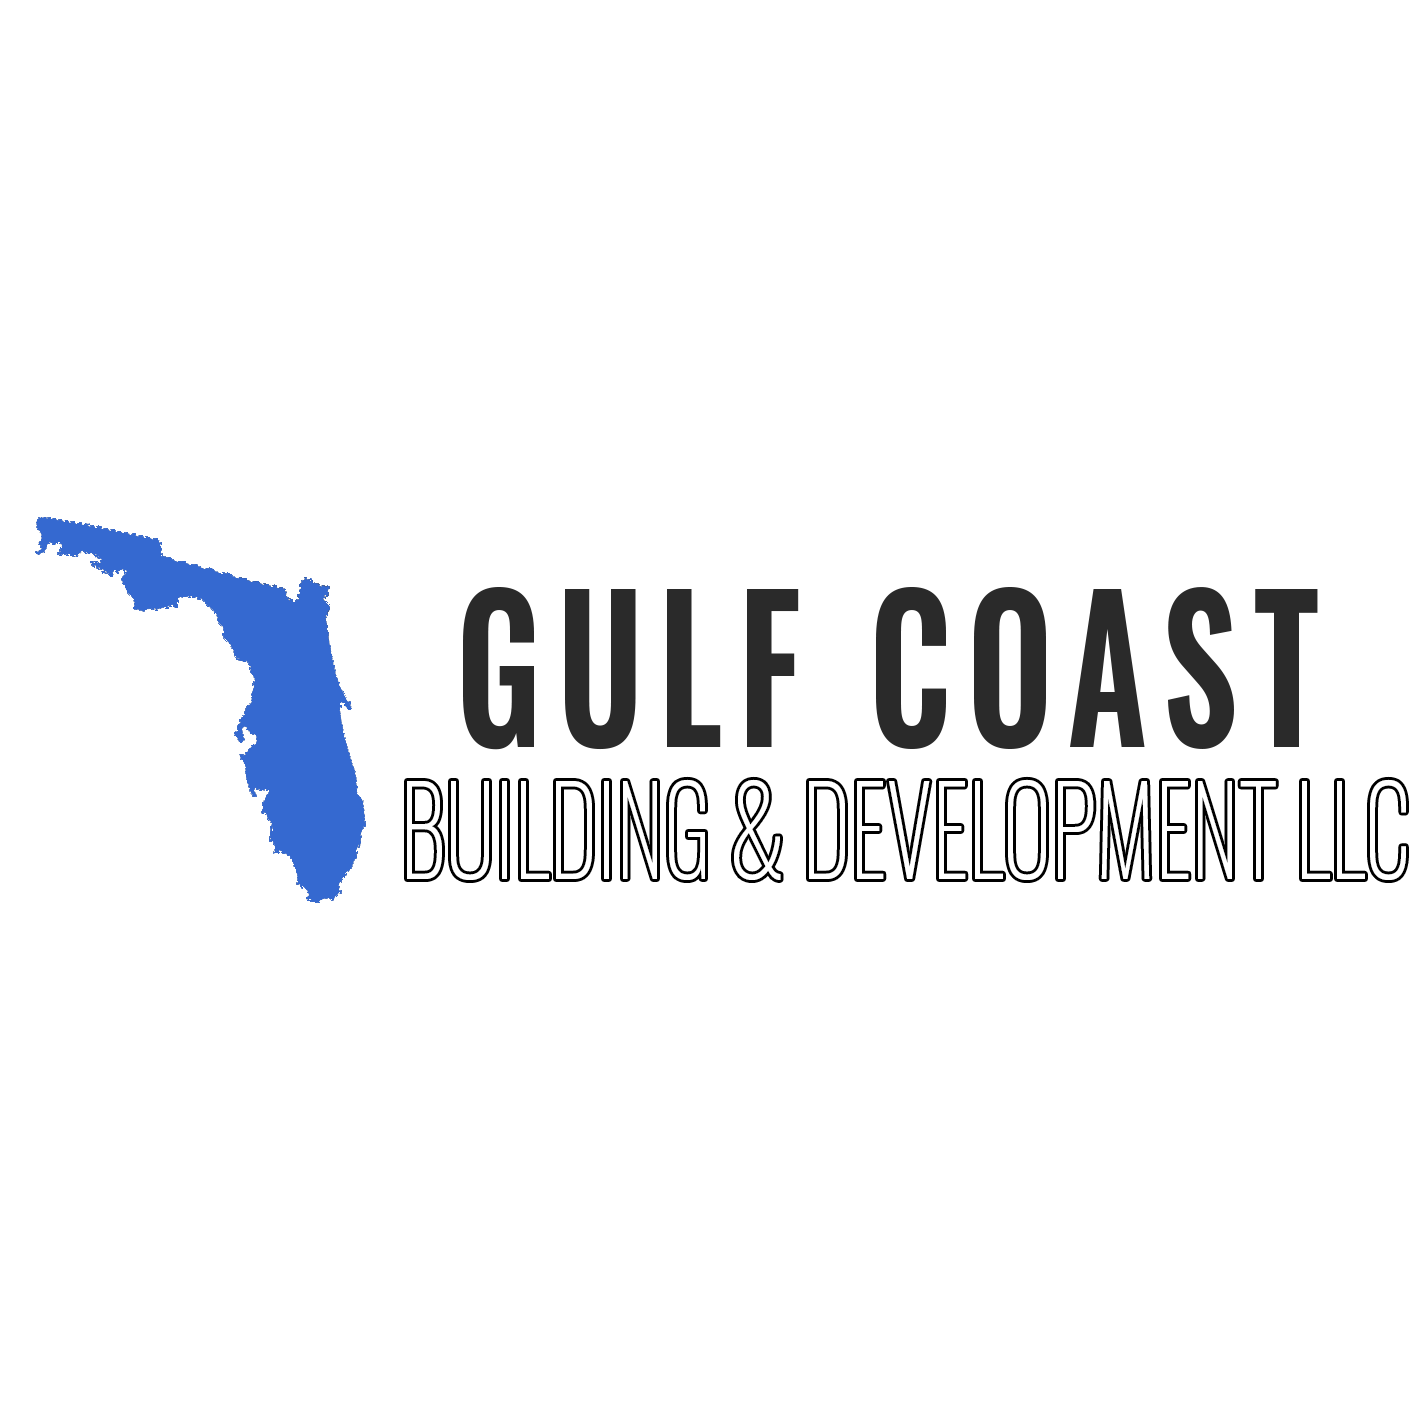 Gulf Coast Building & Development LLC